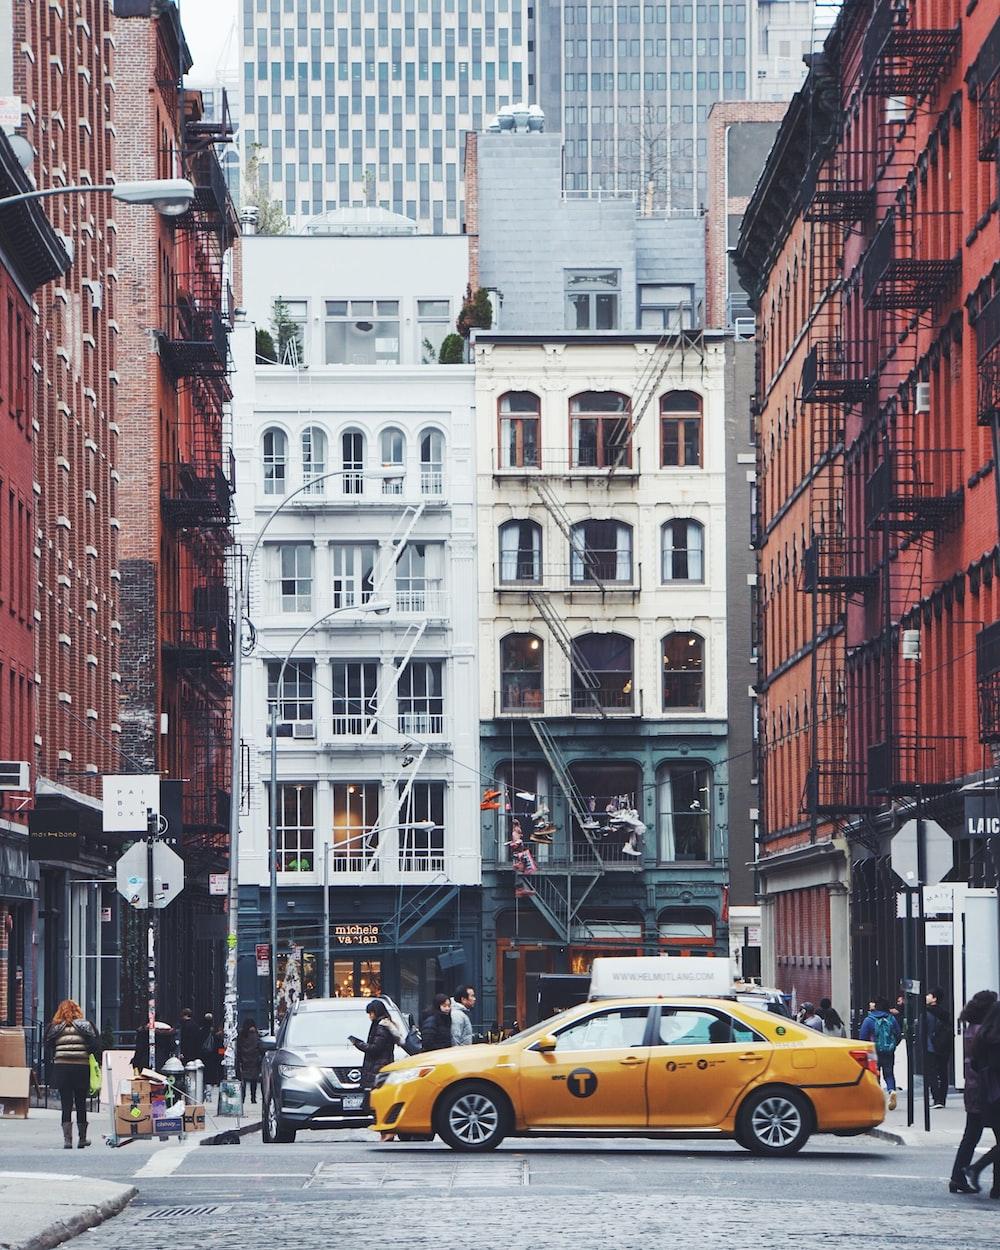 yellow sedan on road near buildings with people walks